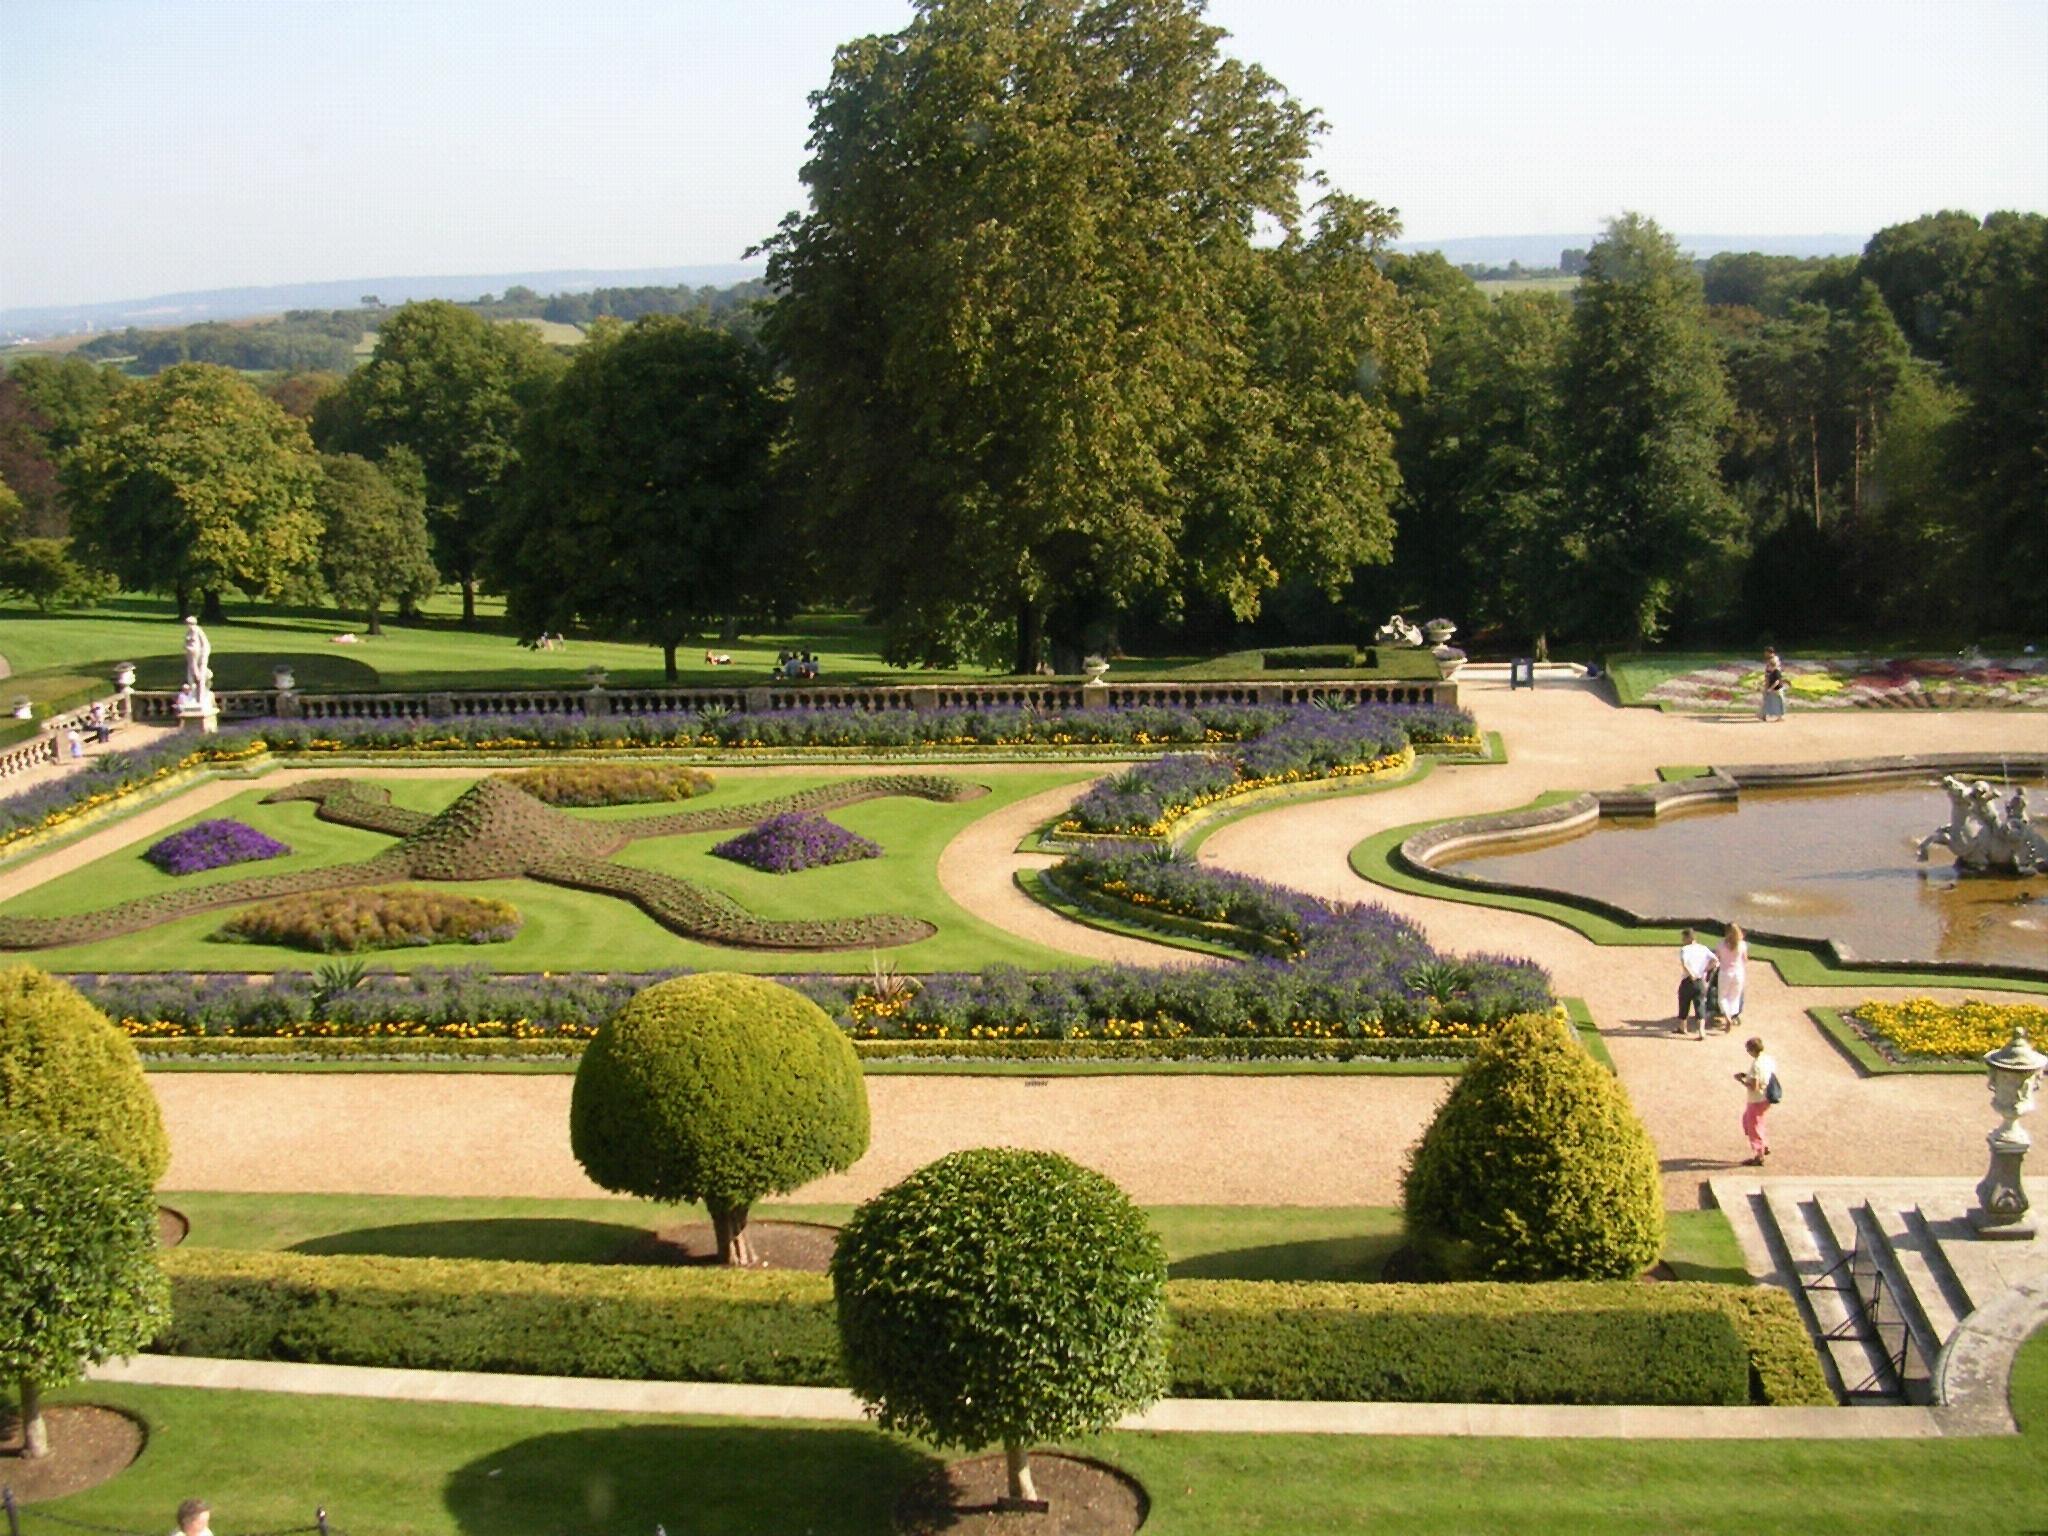 Parterre (Jardinage) — Wikipédia concernant Parterre Decoratif